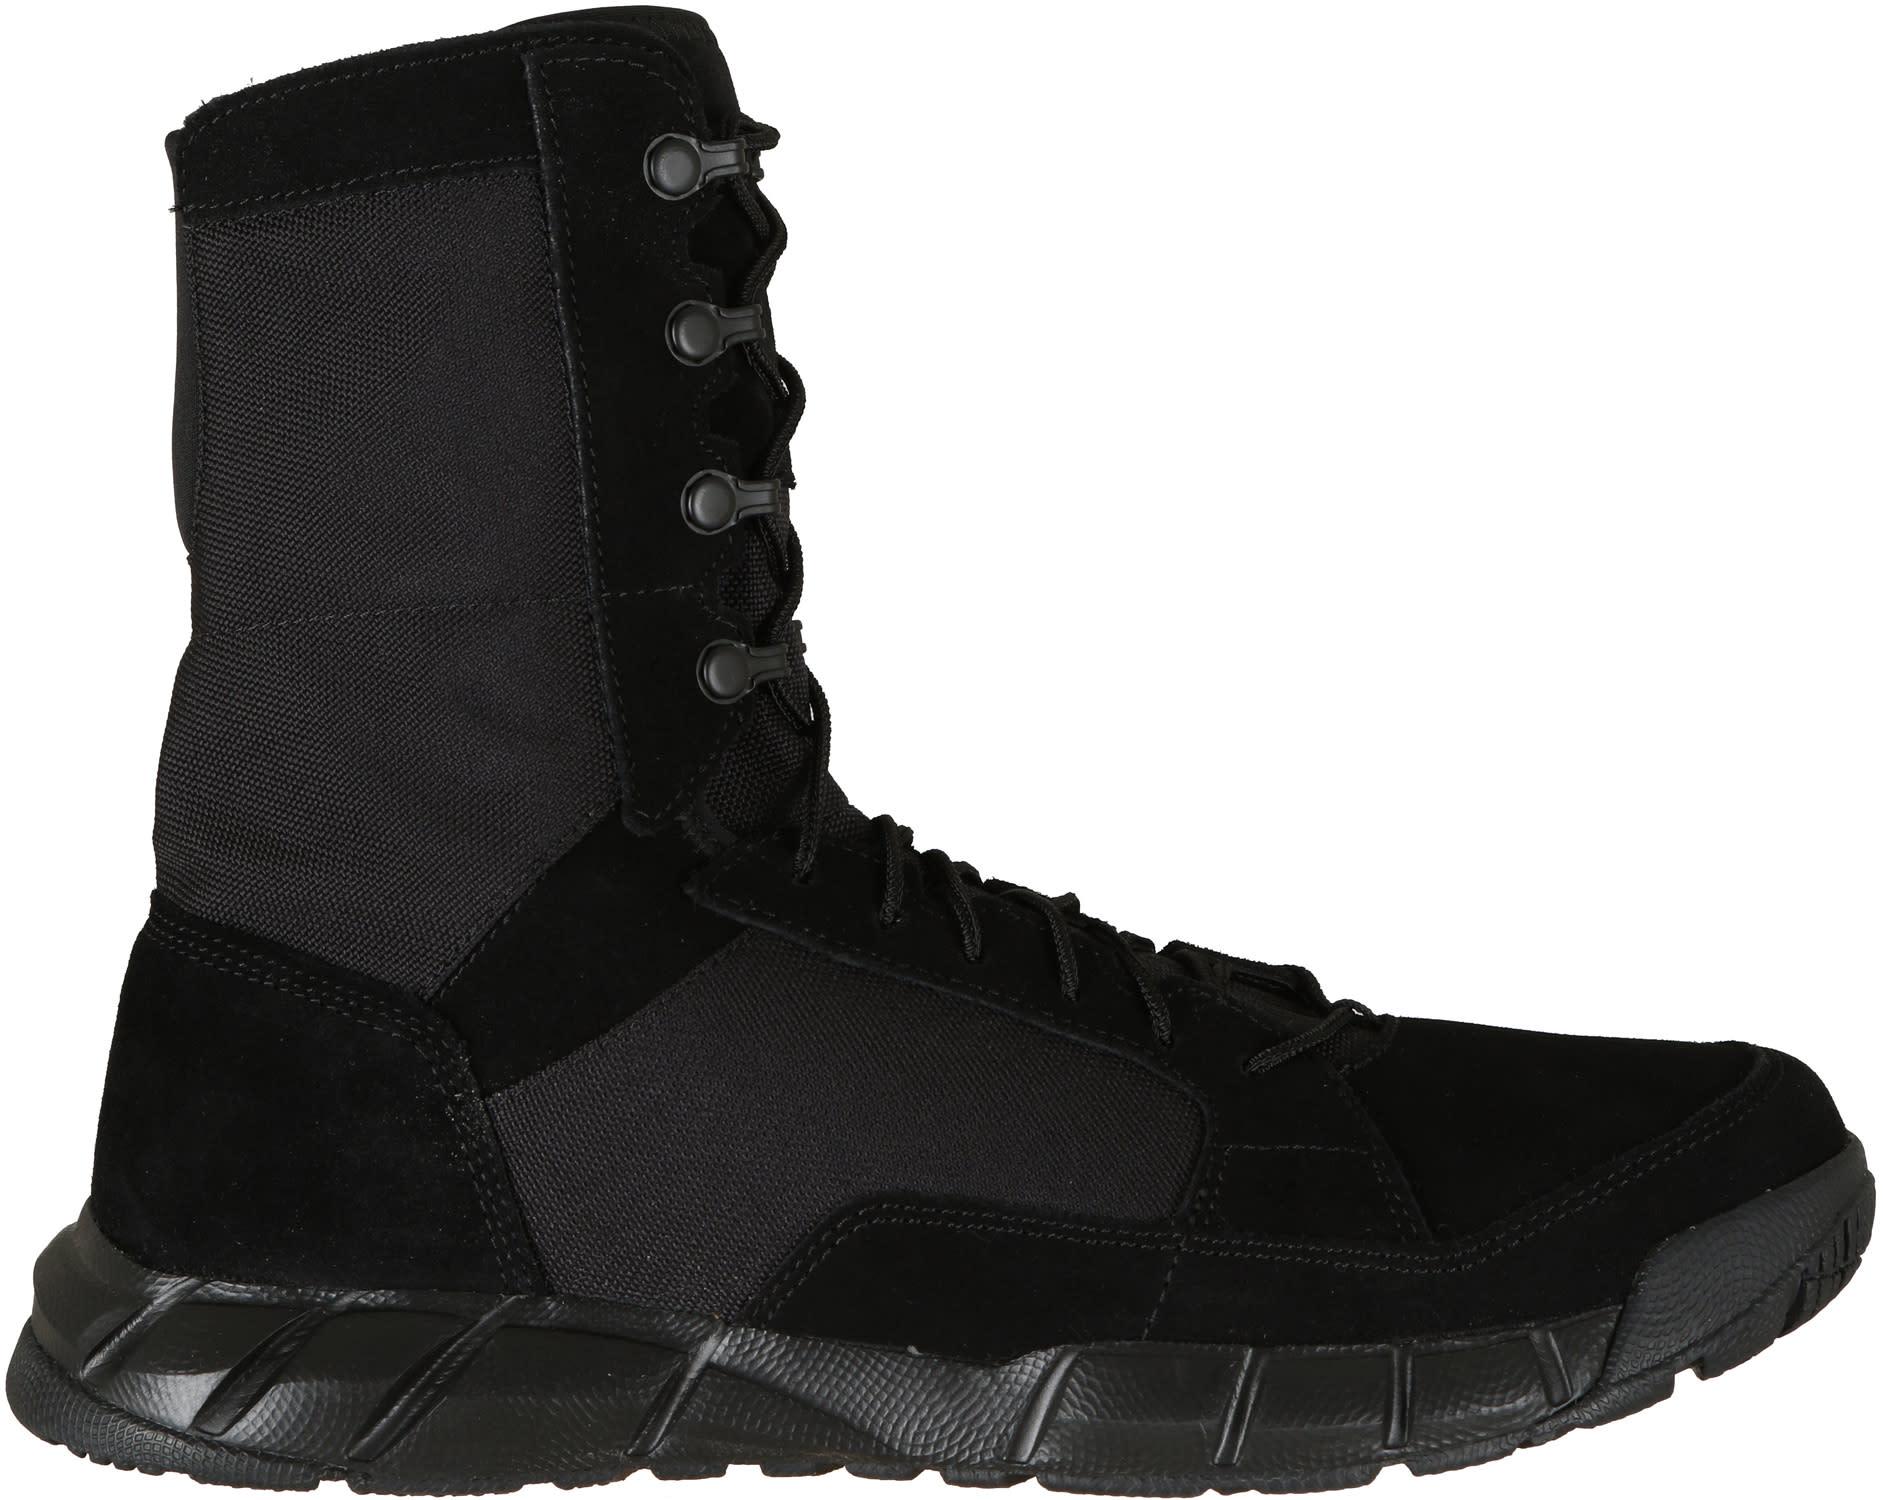 Ski Boots Sale >> Oakley LT Assault 2 Boots